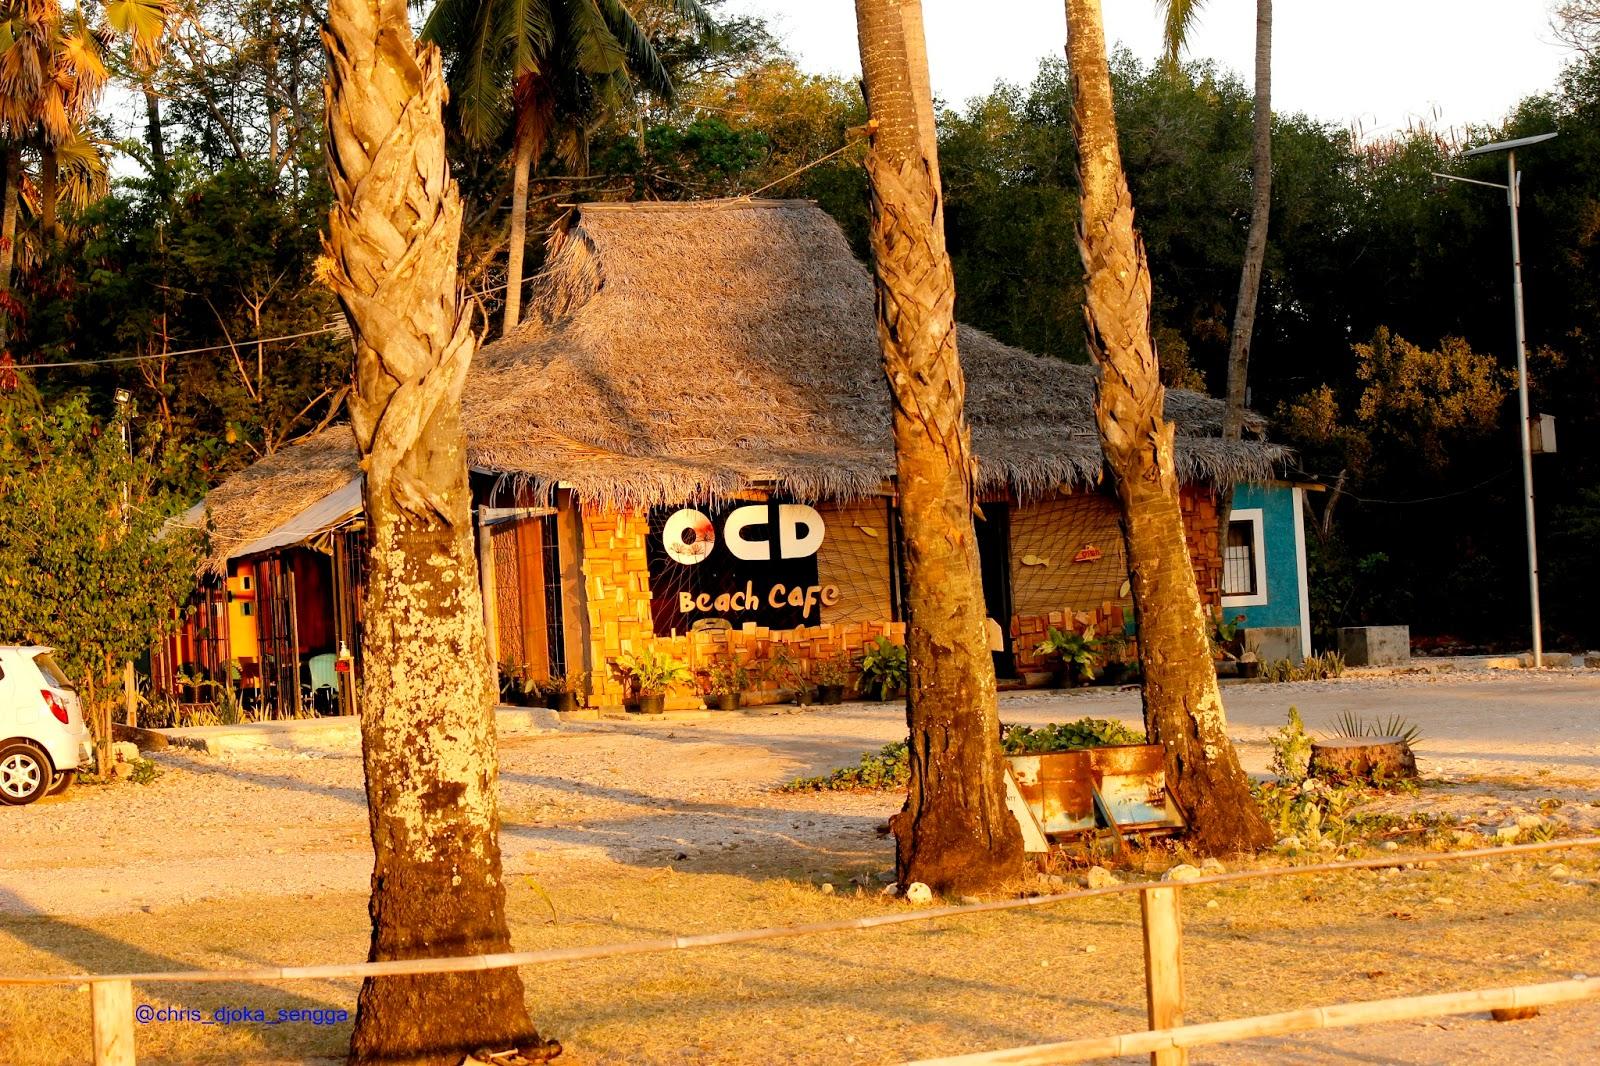 Sunset Kupang Flores Borneo Ocd Beach Cafe Pantai Lasiana Ntt